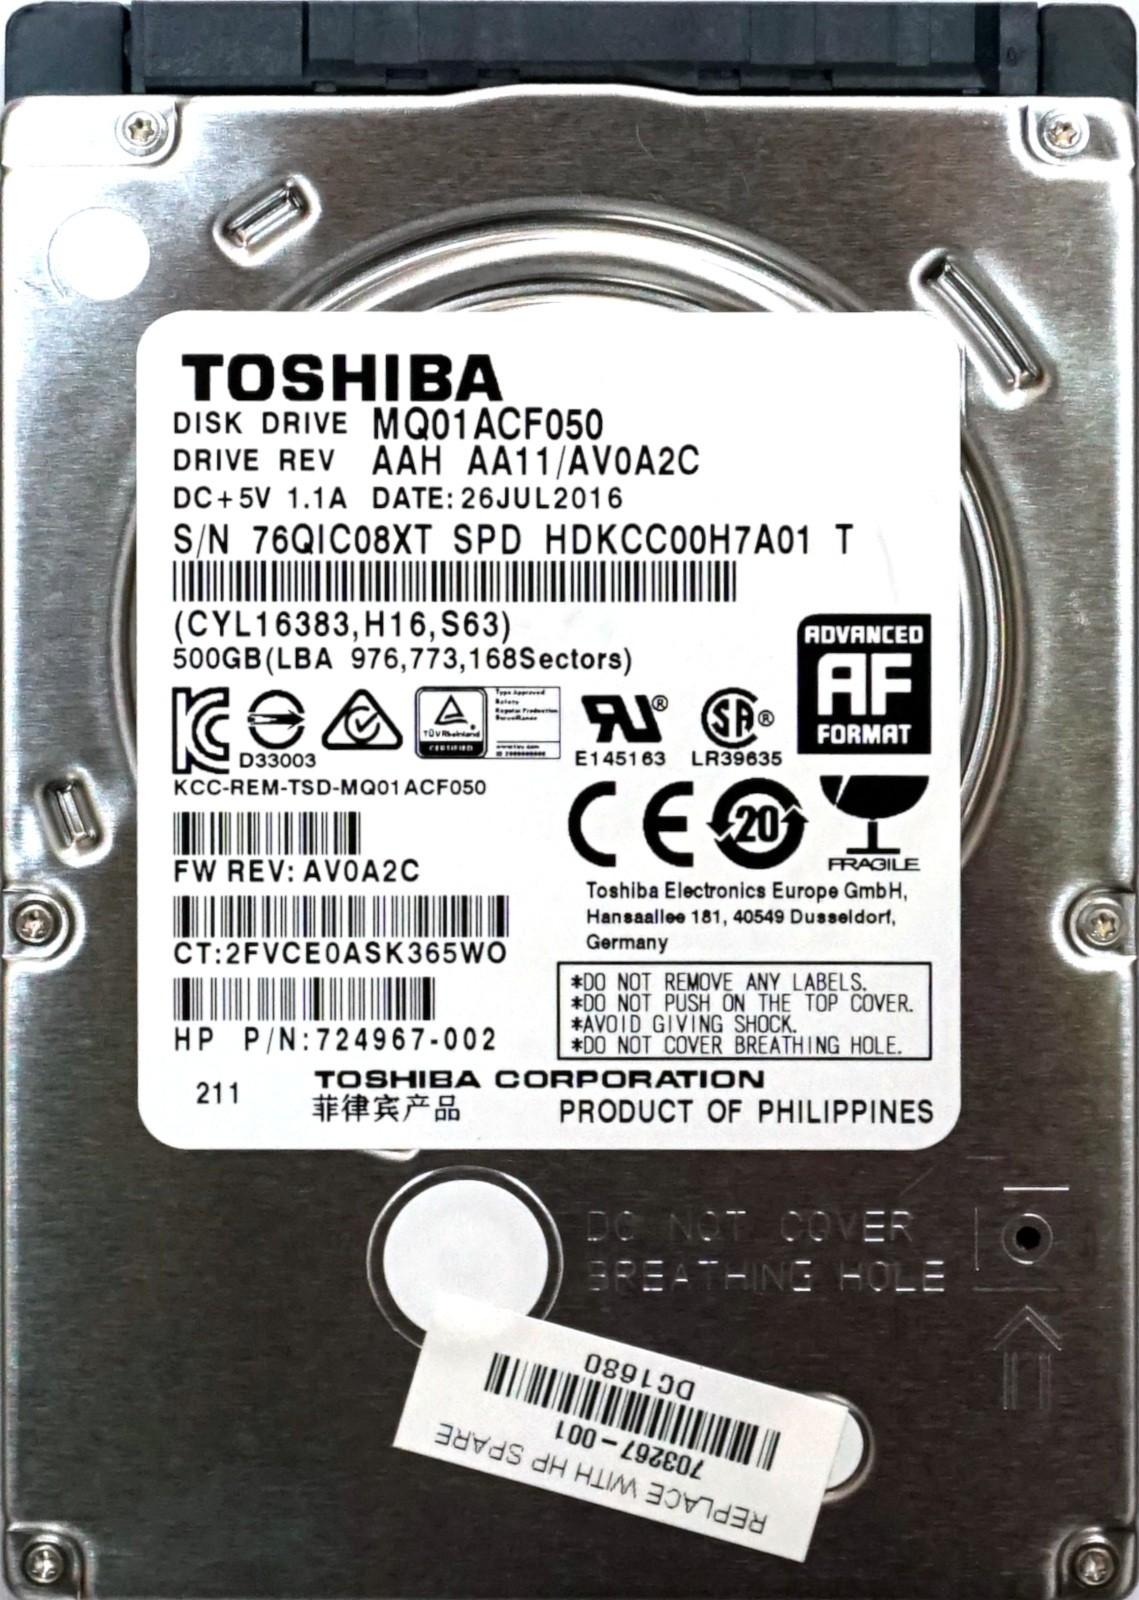 Toshiba (MQ01ACF050) 500GB SATA III (SFF) 6Gb/s 7 2K HDD